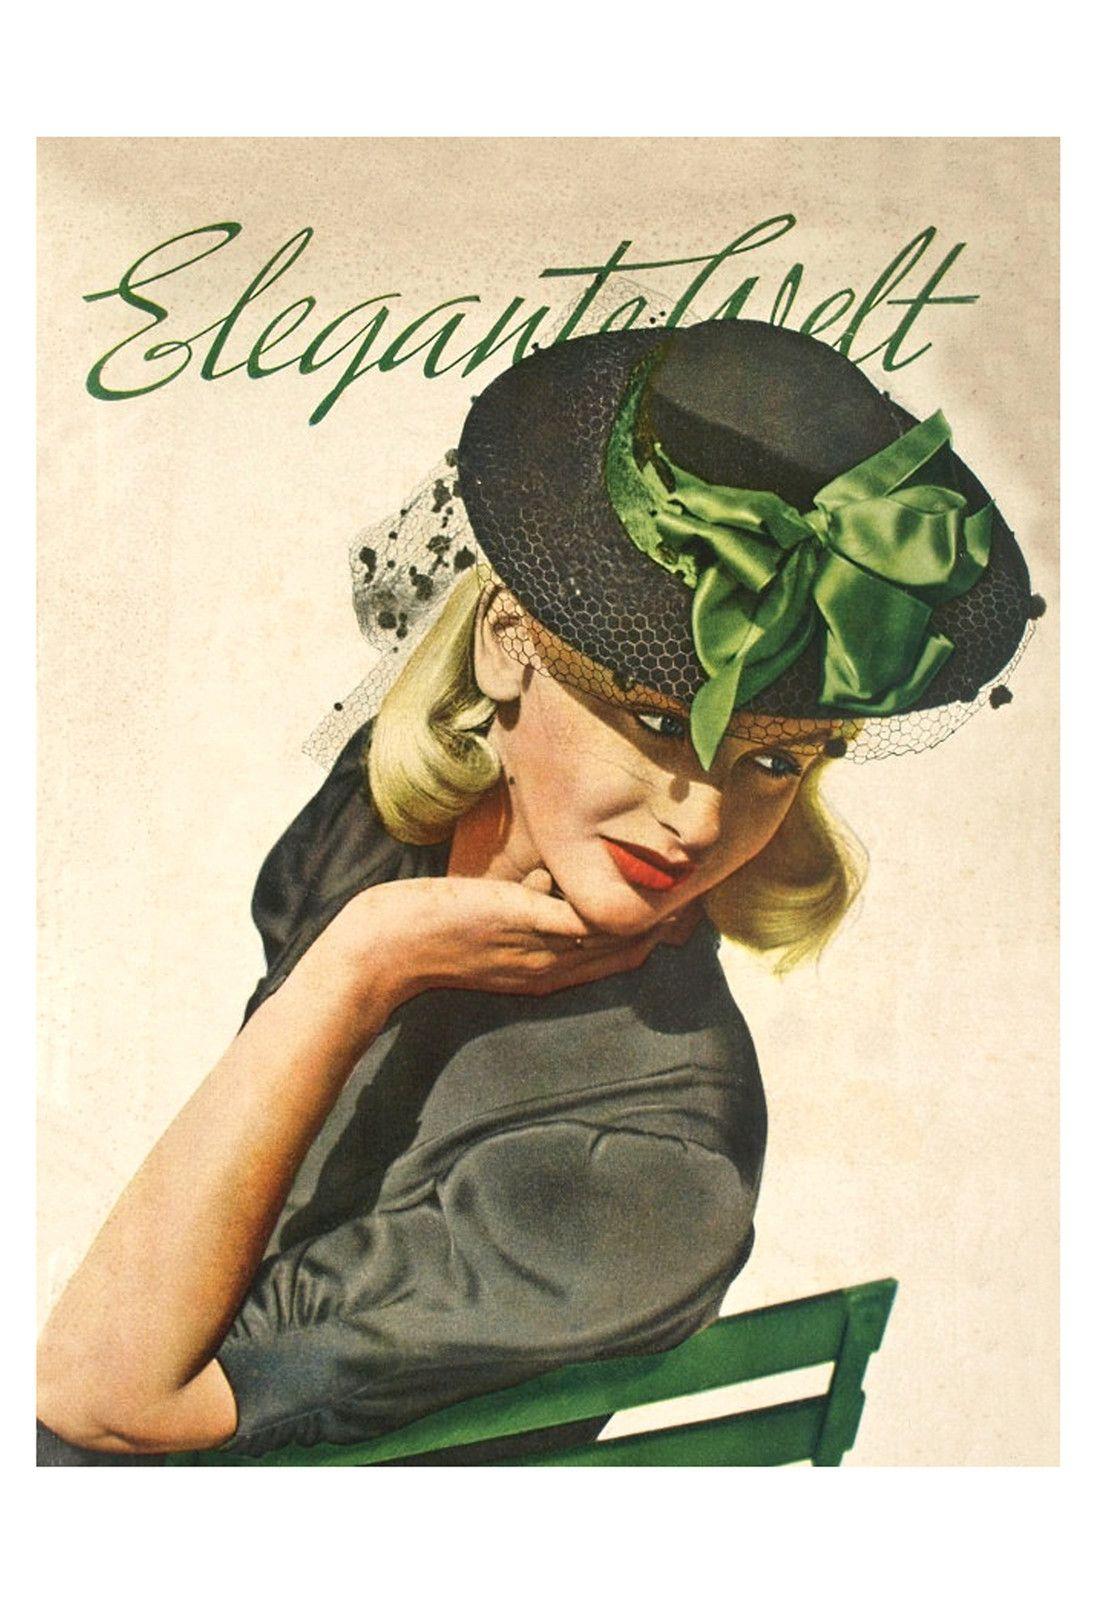 Elegante Welt - Germany, 1930's